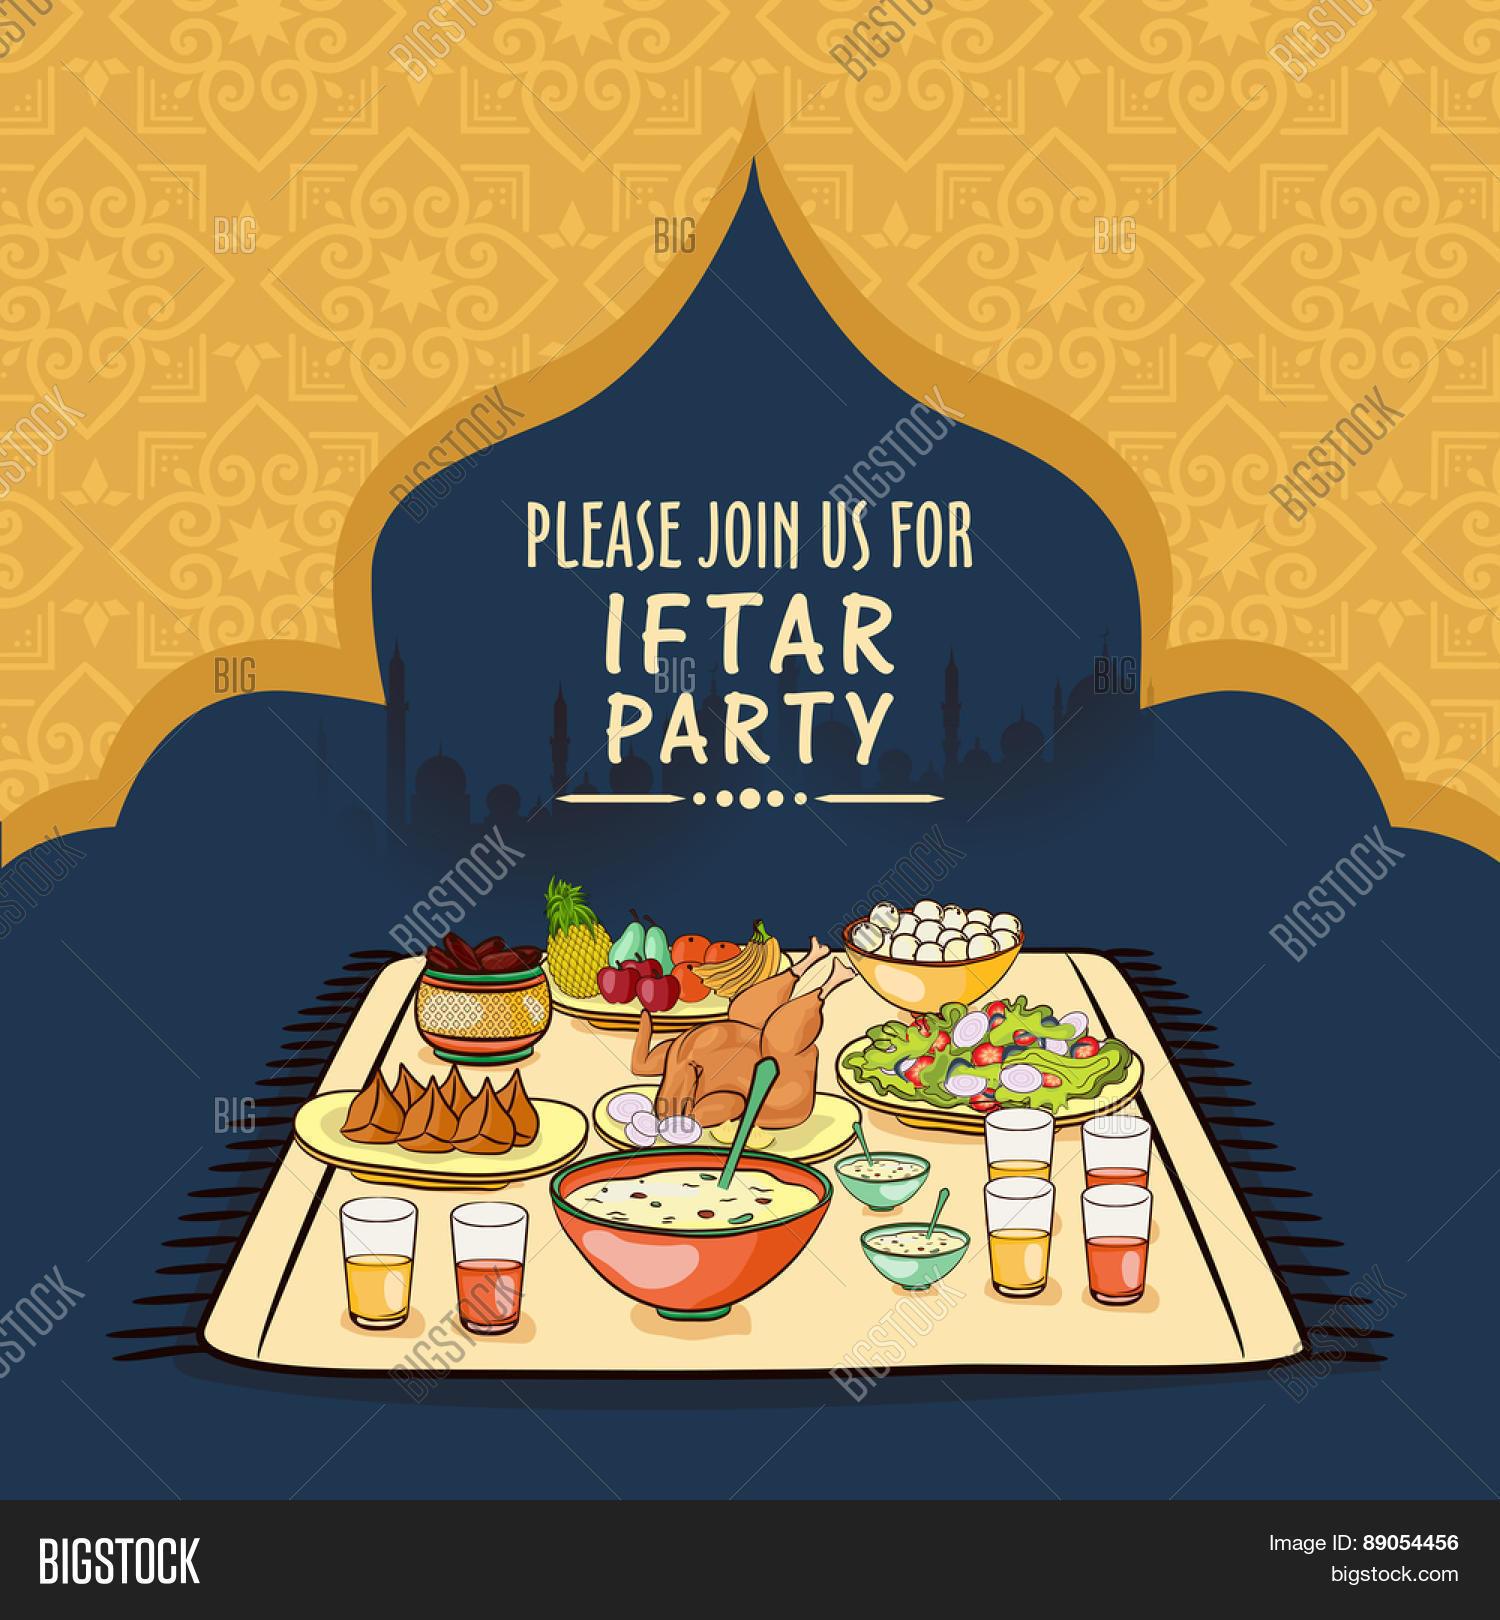 Arabic Invitation Cards is amazing invitations template